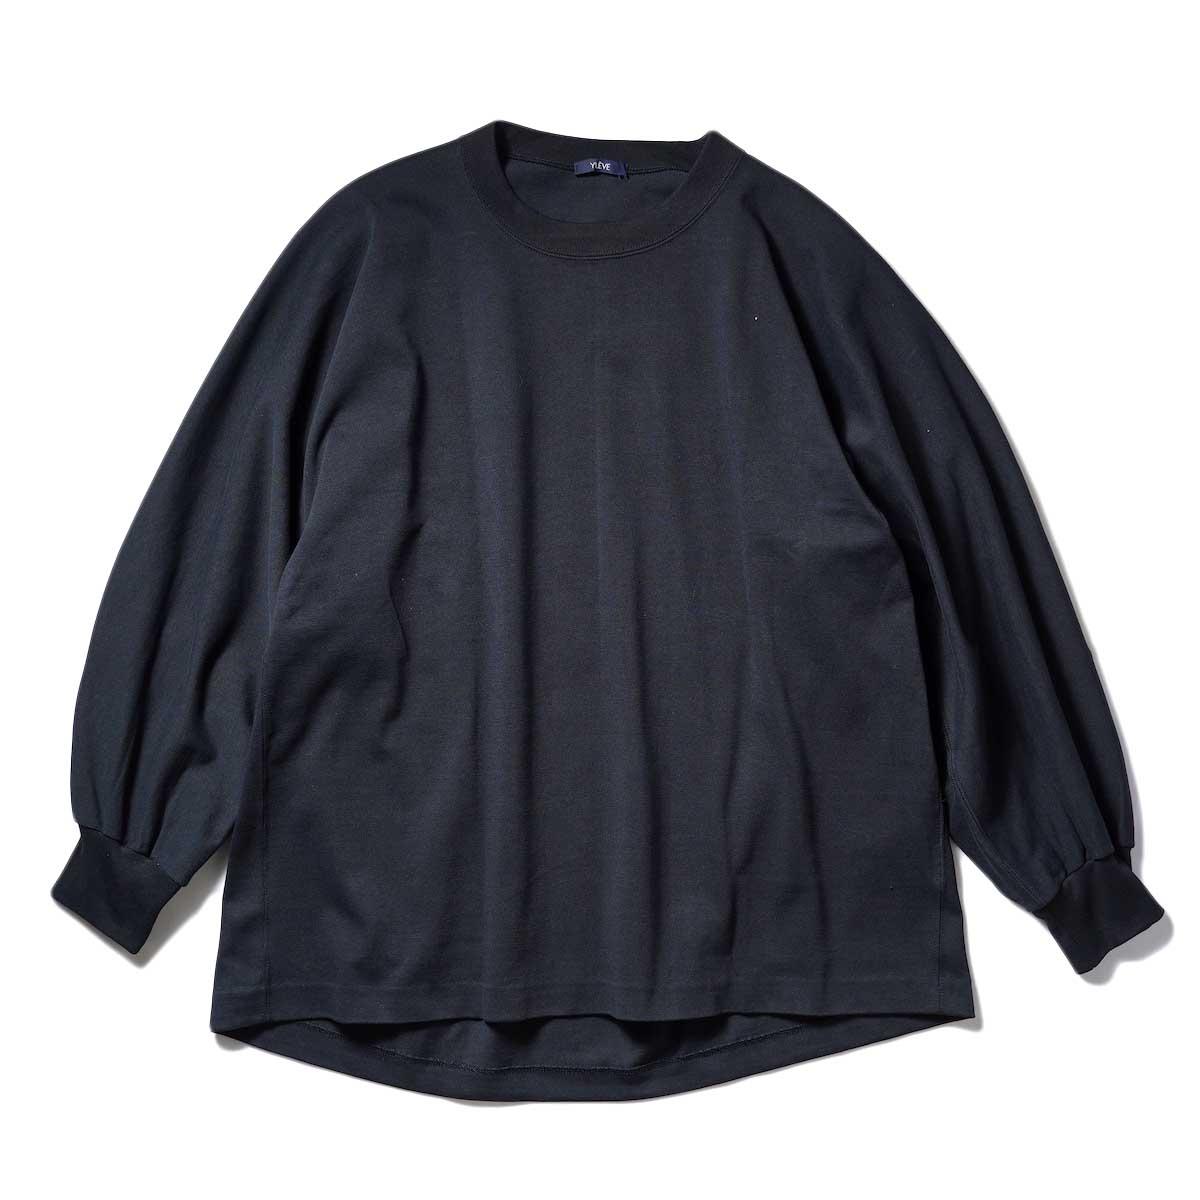 YLEVE / TWIST YARN COTTON BIG P/O (Black)